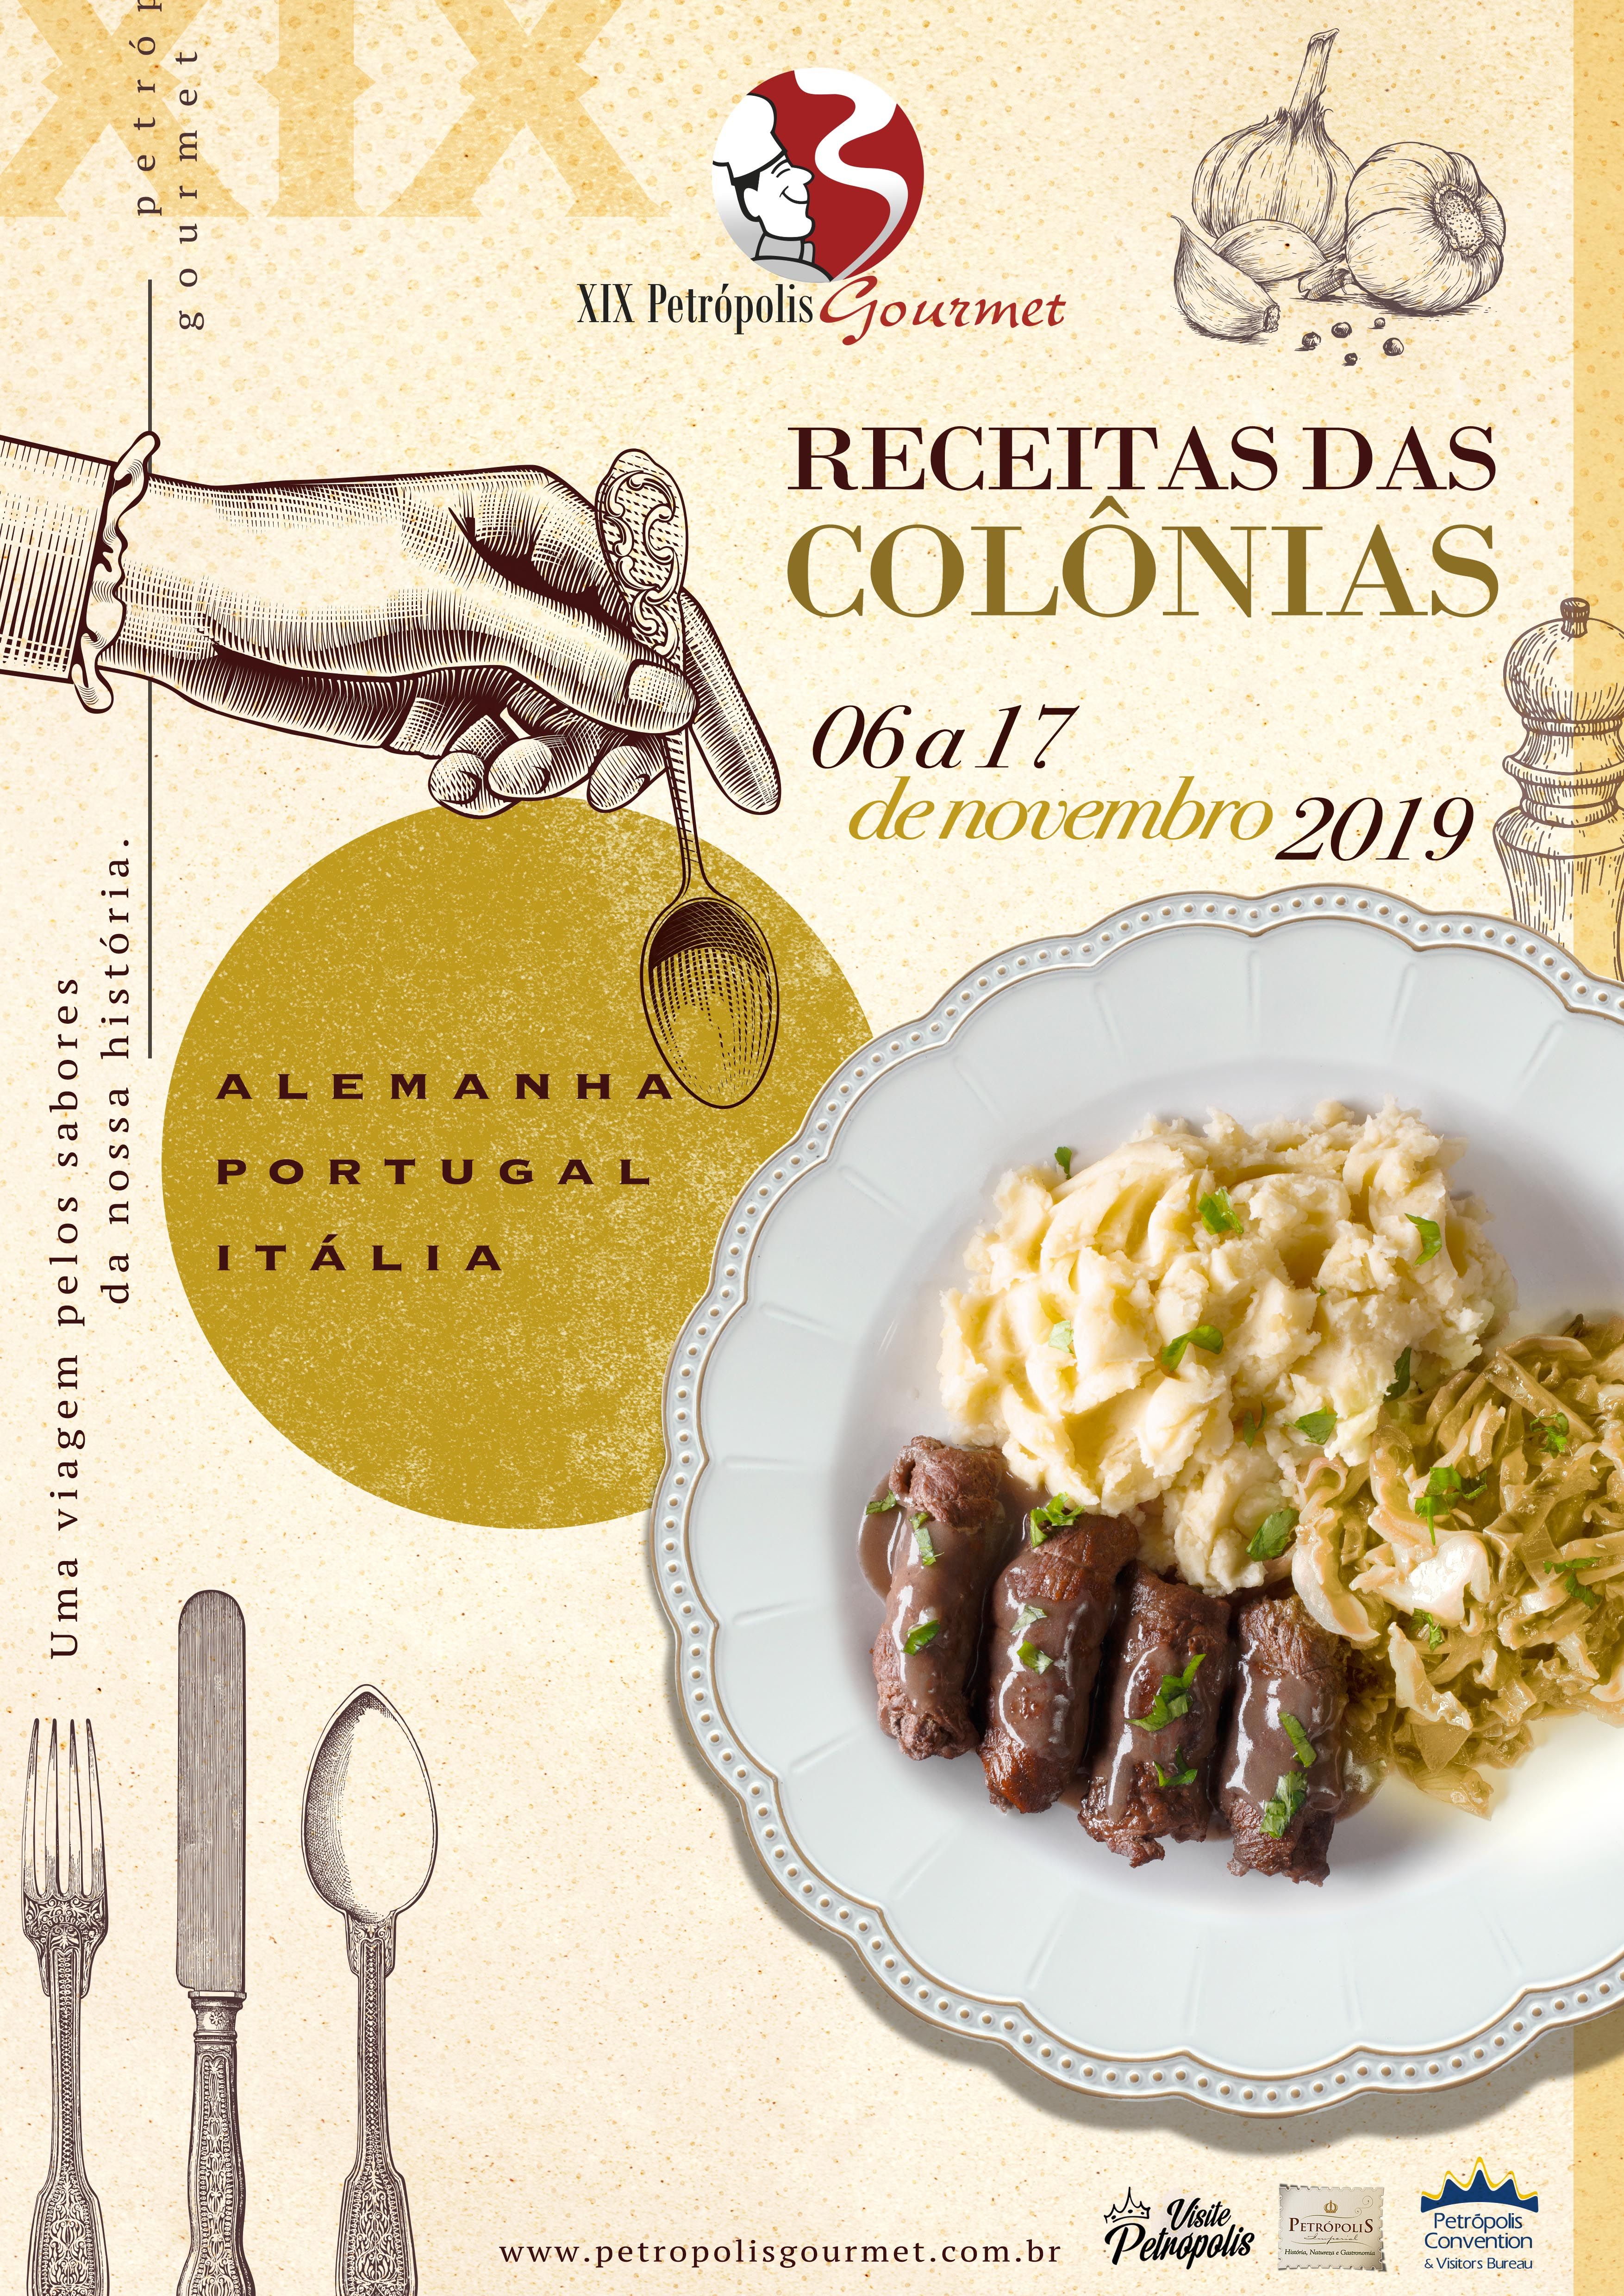 XIX Petrópolis Gourmet